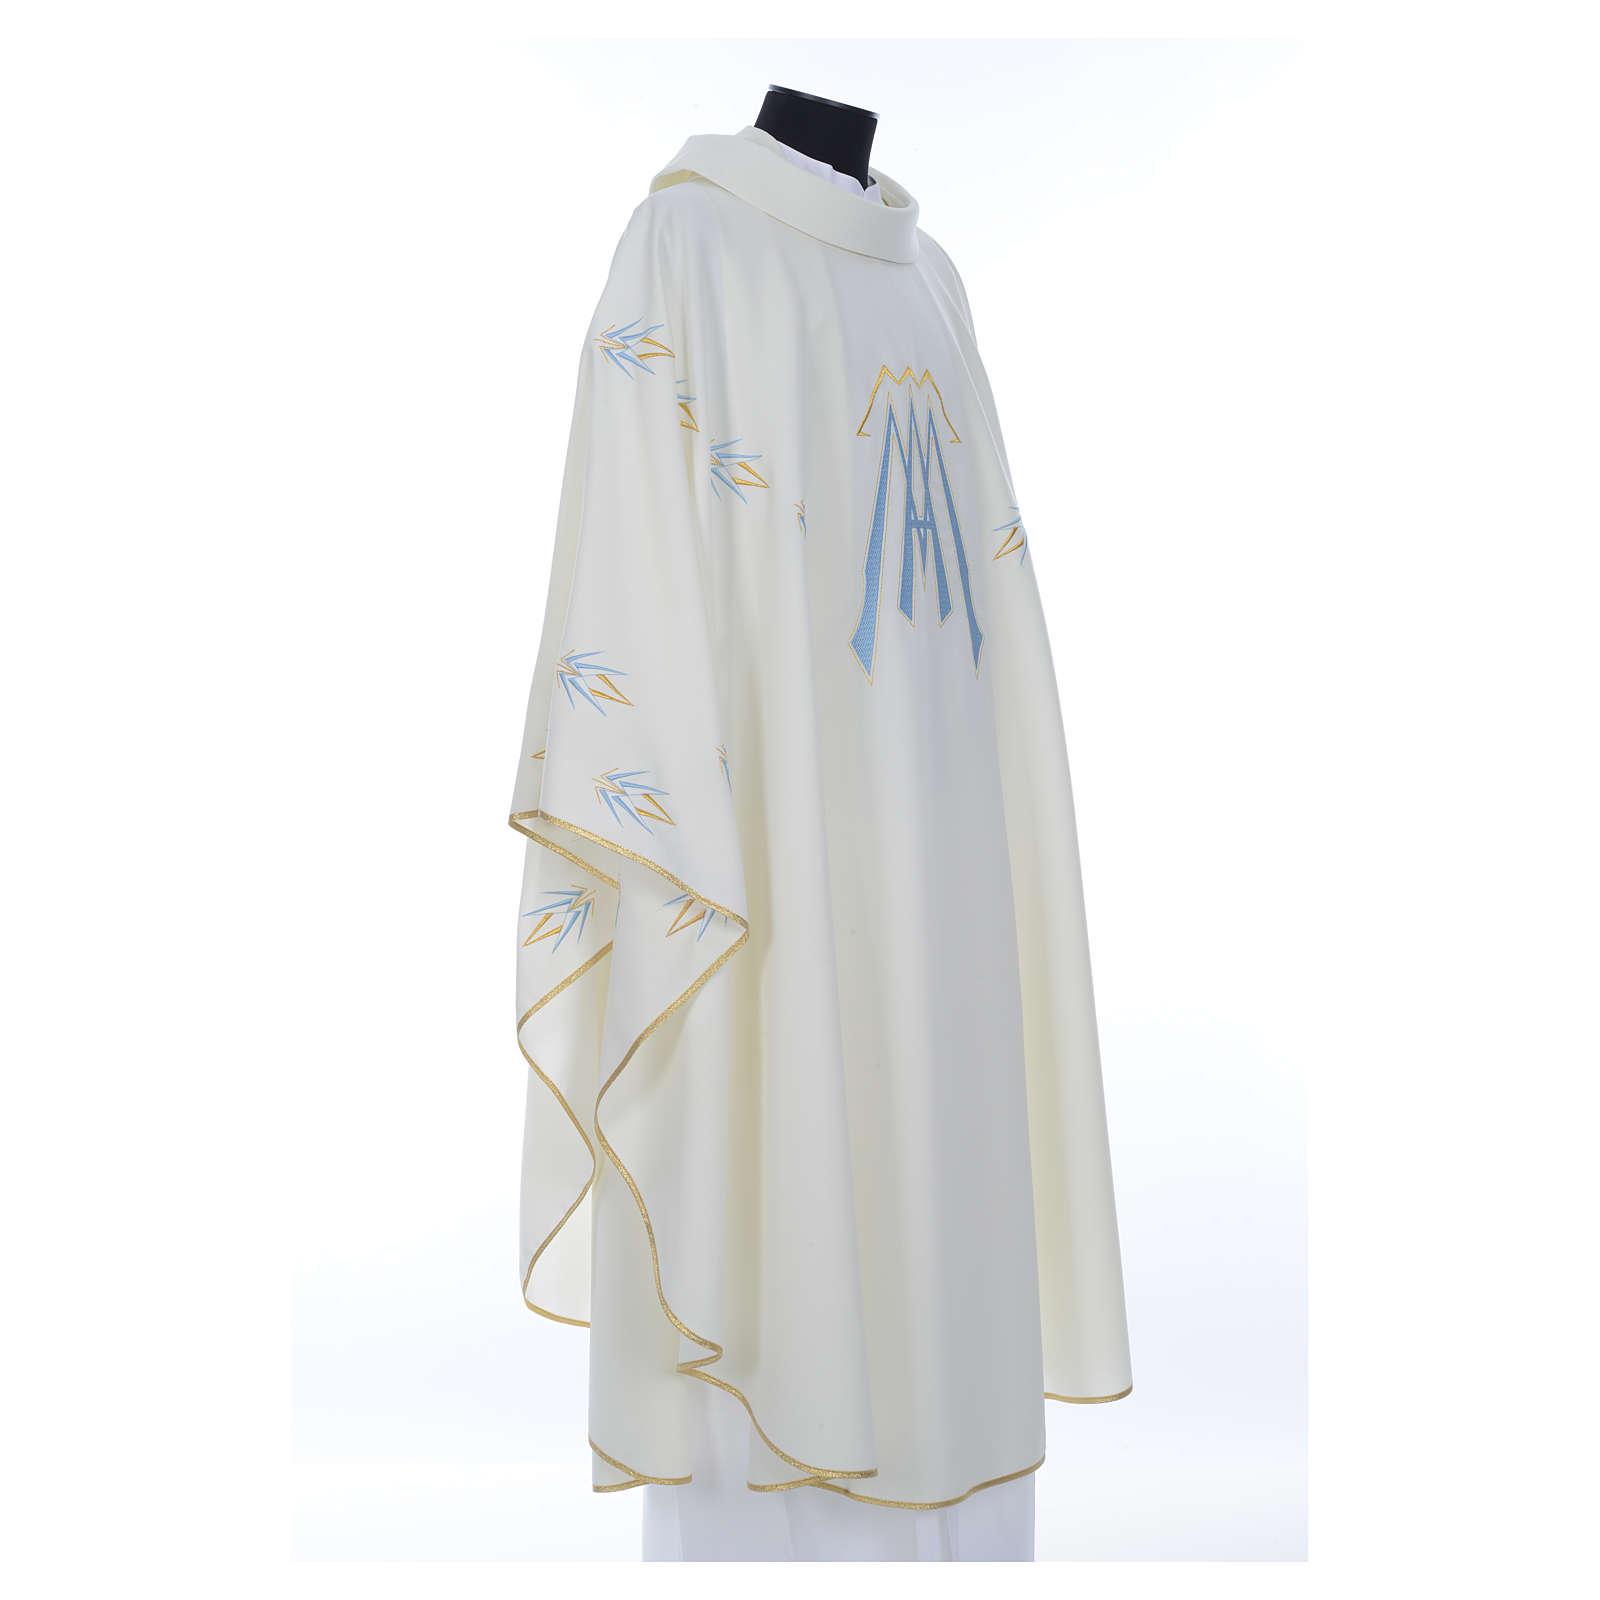 Casula ricamata simbolo mariano poliestere 4